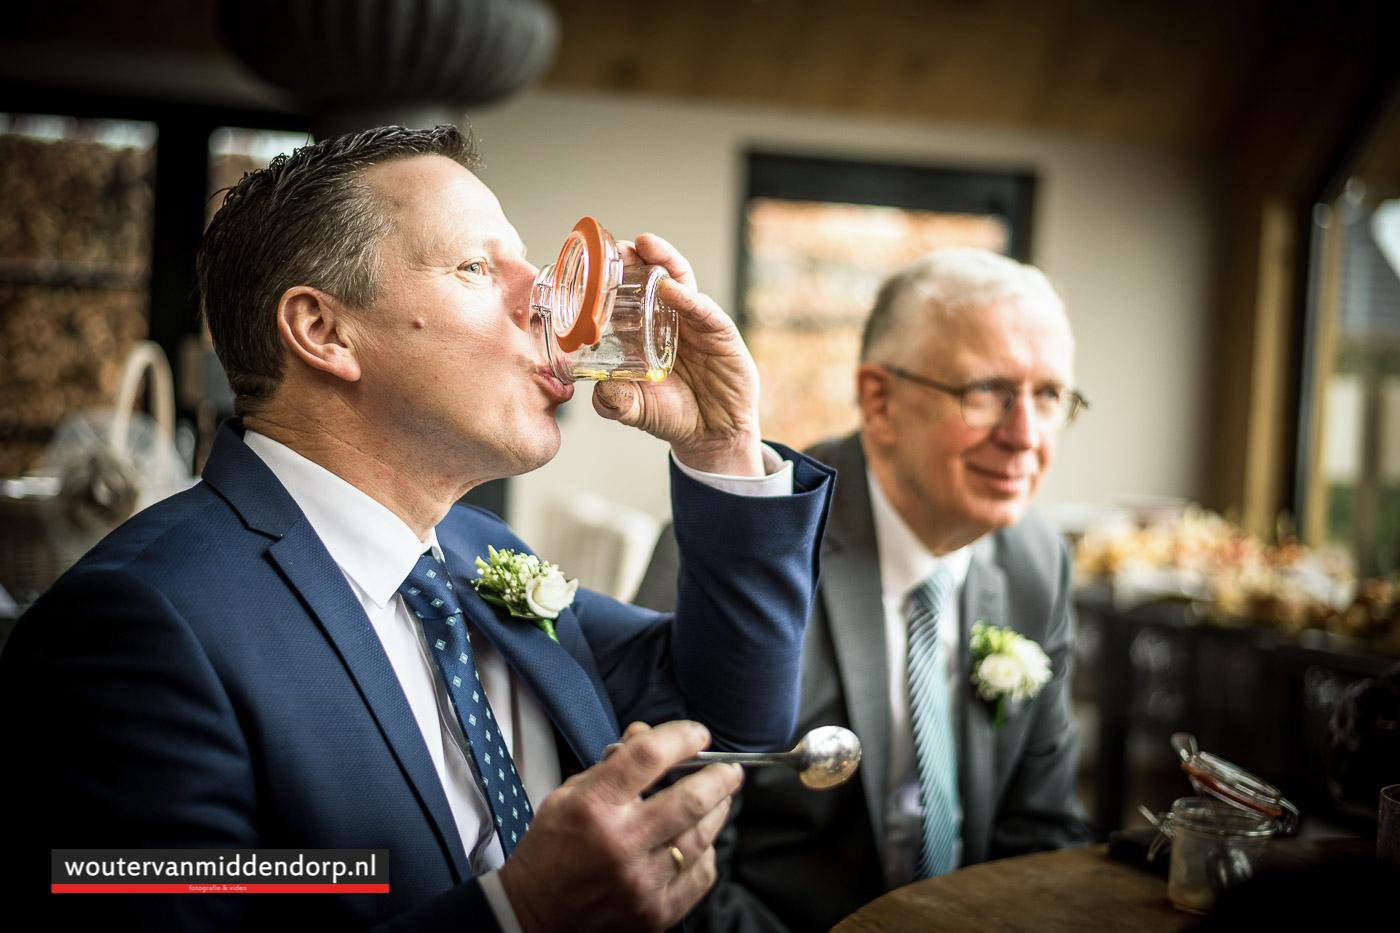 bruidsfotografie Wouter van Middendorp Uddel Elspeet Barneveld, omgeving trouwfotograaf-28